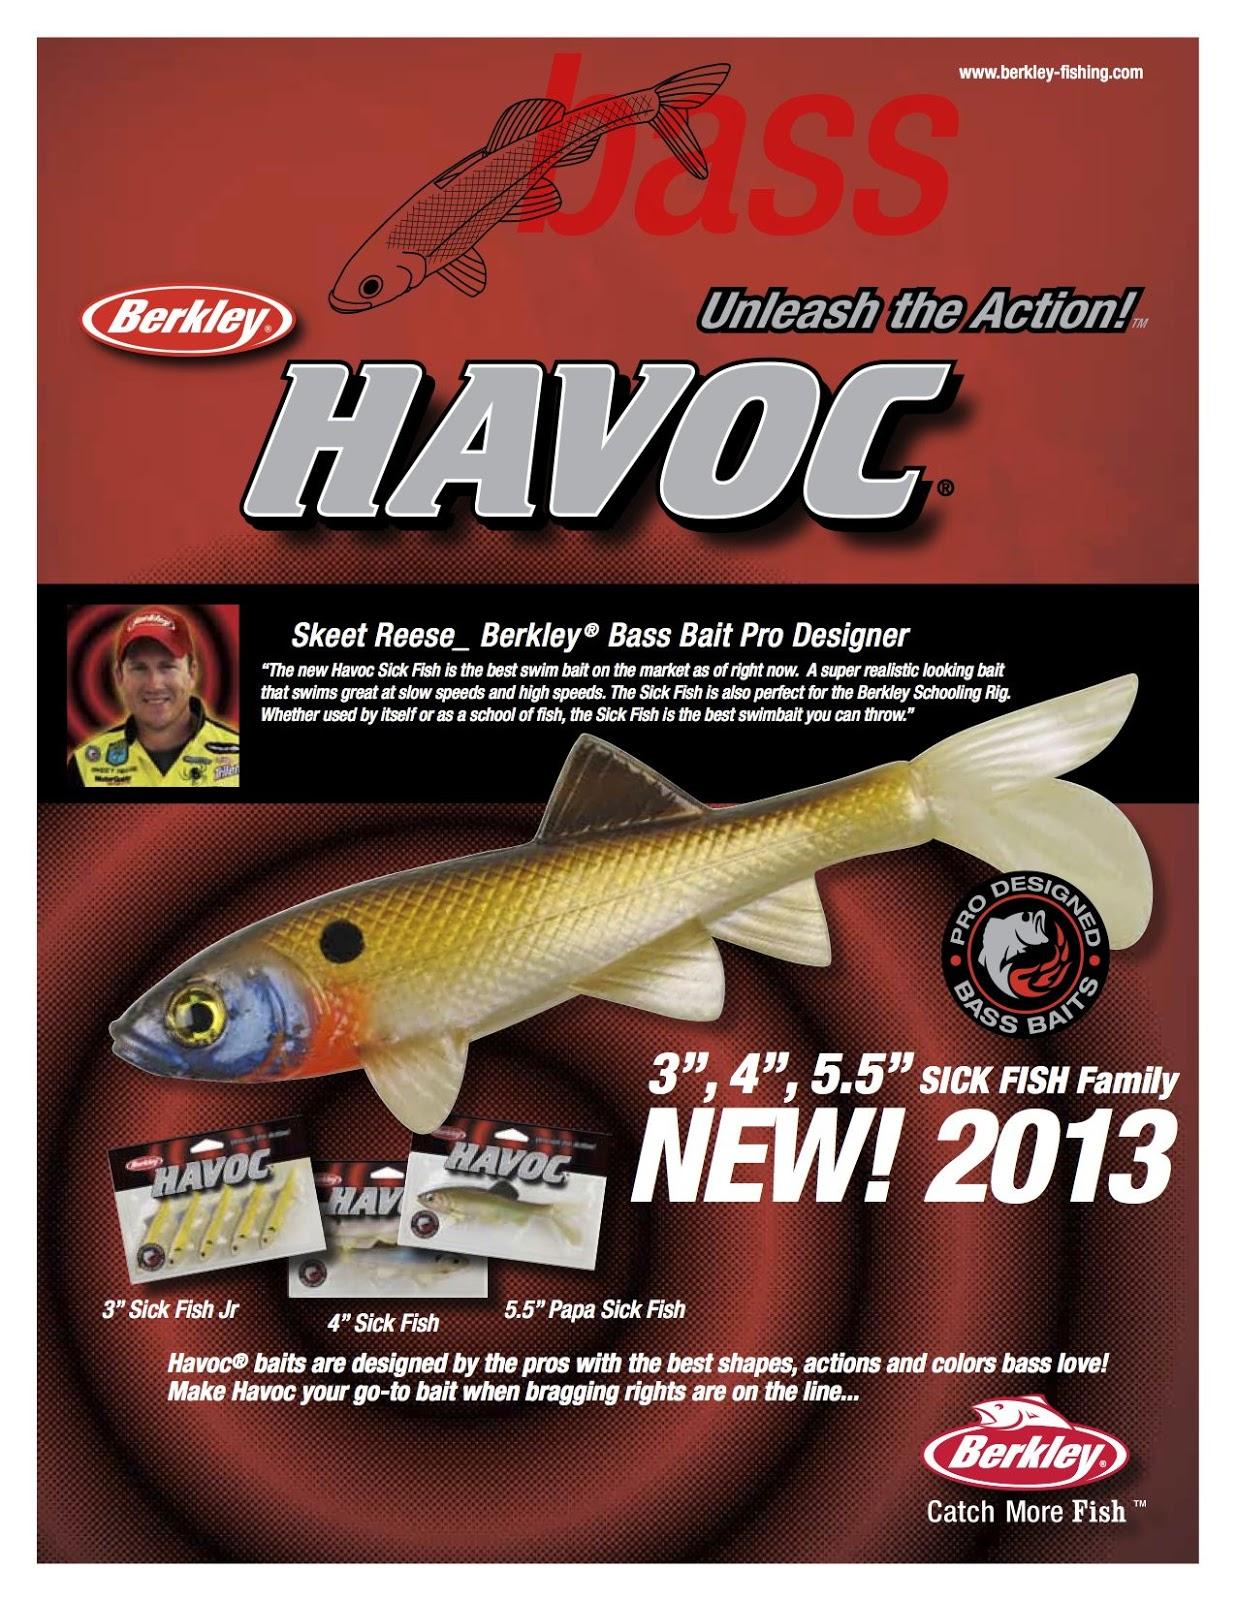 IBASSIN: Swim with the Sharks! HAVOC\' s New Sick Fish